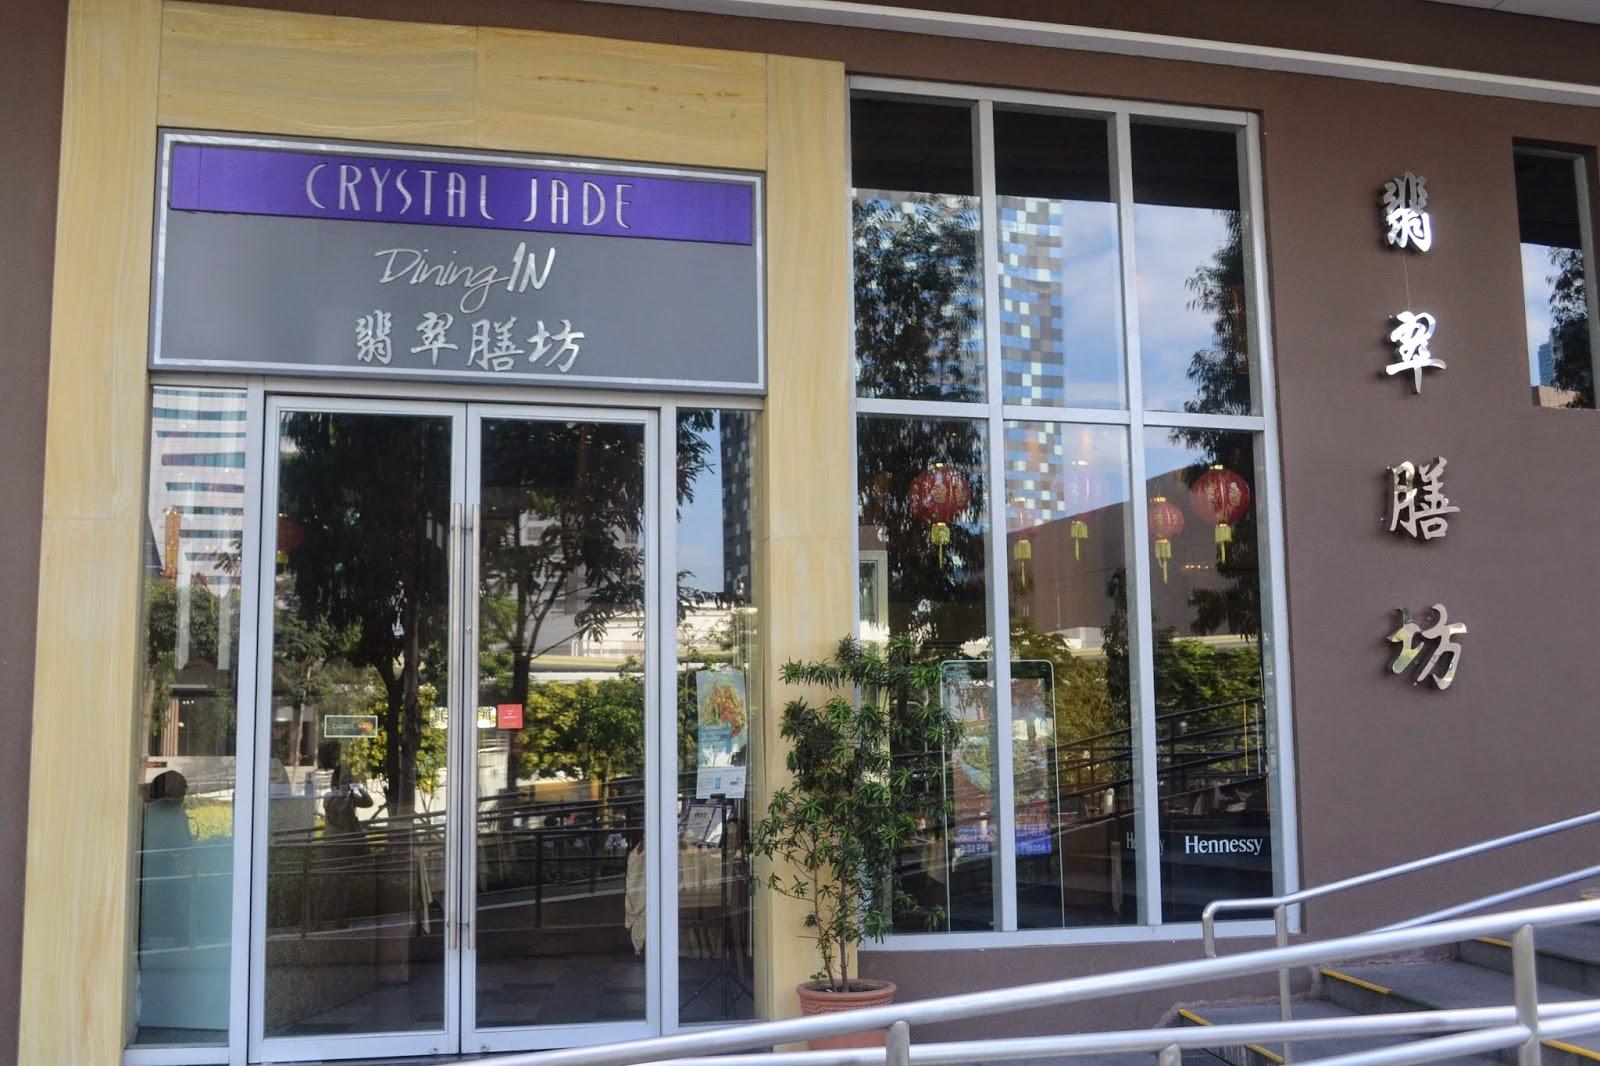 Crystal Jade Bgc Function Room